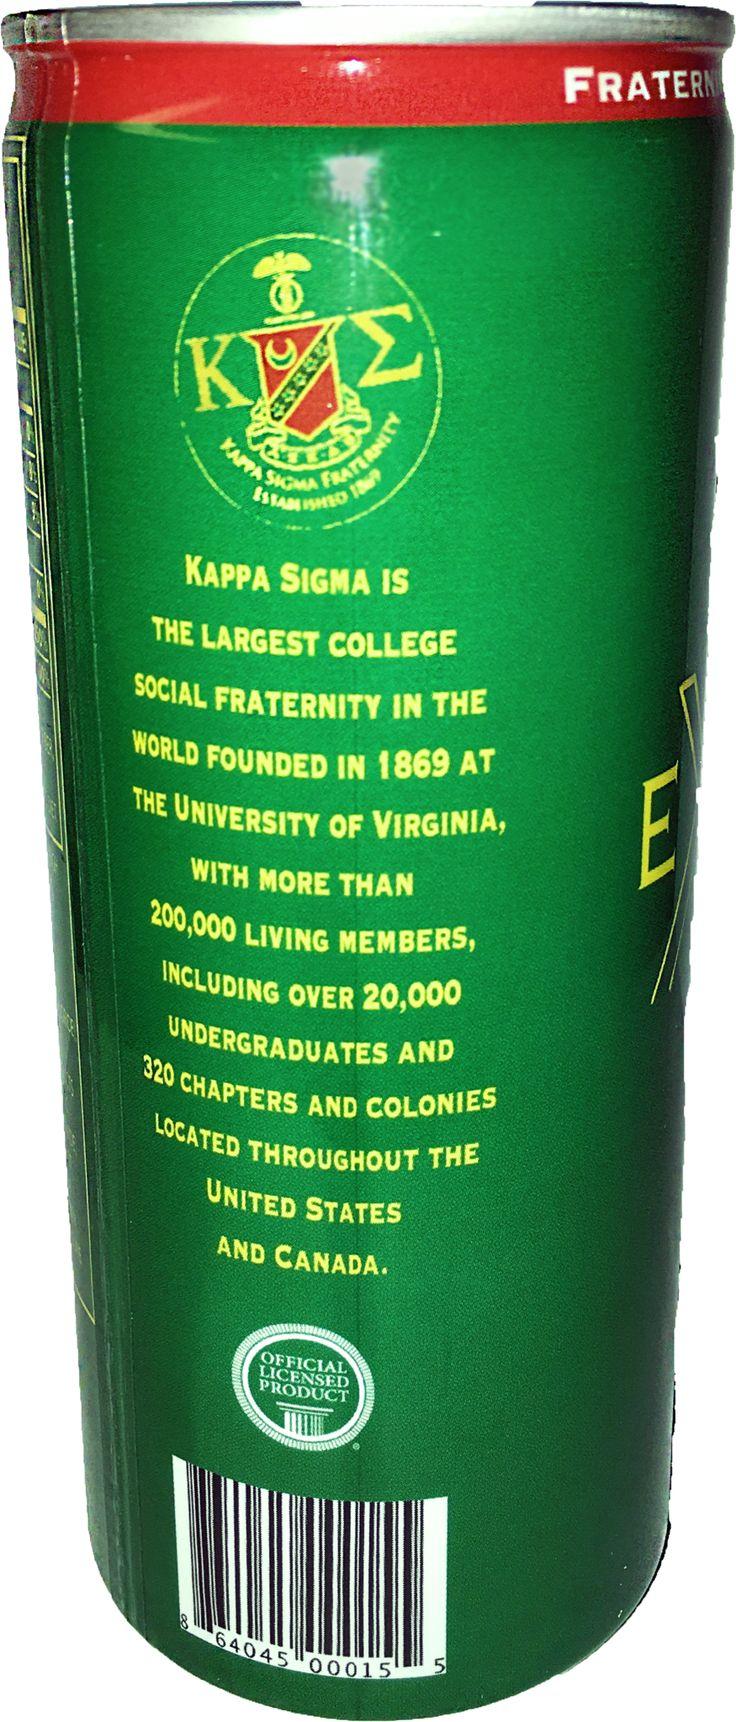 Fraternity Edition: Kappa Sigma